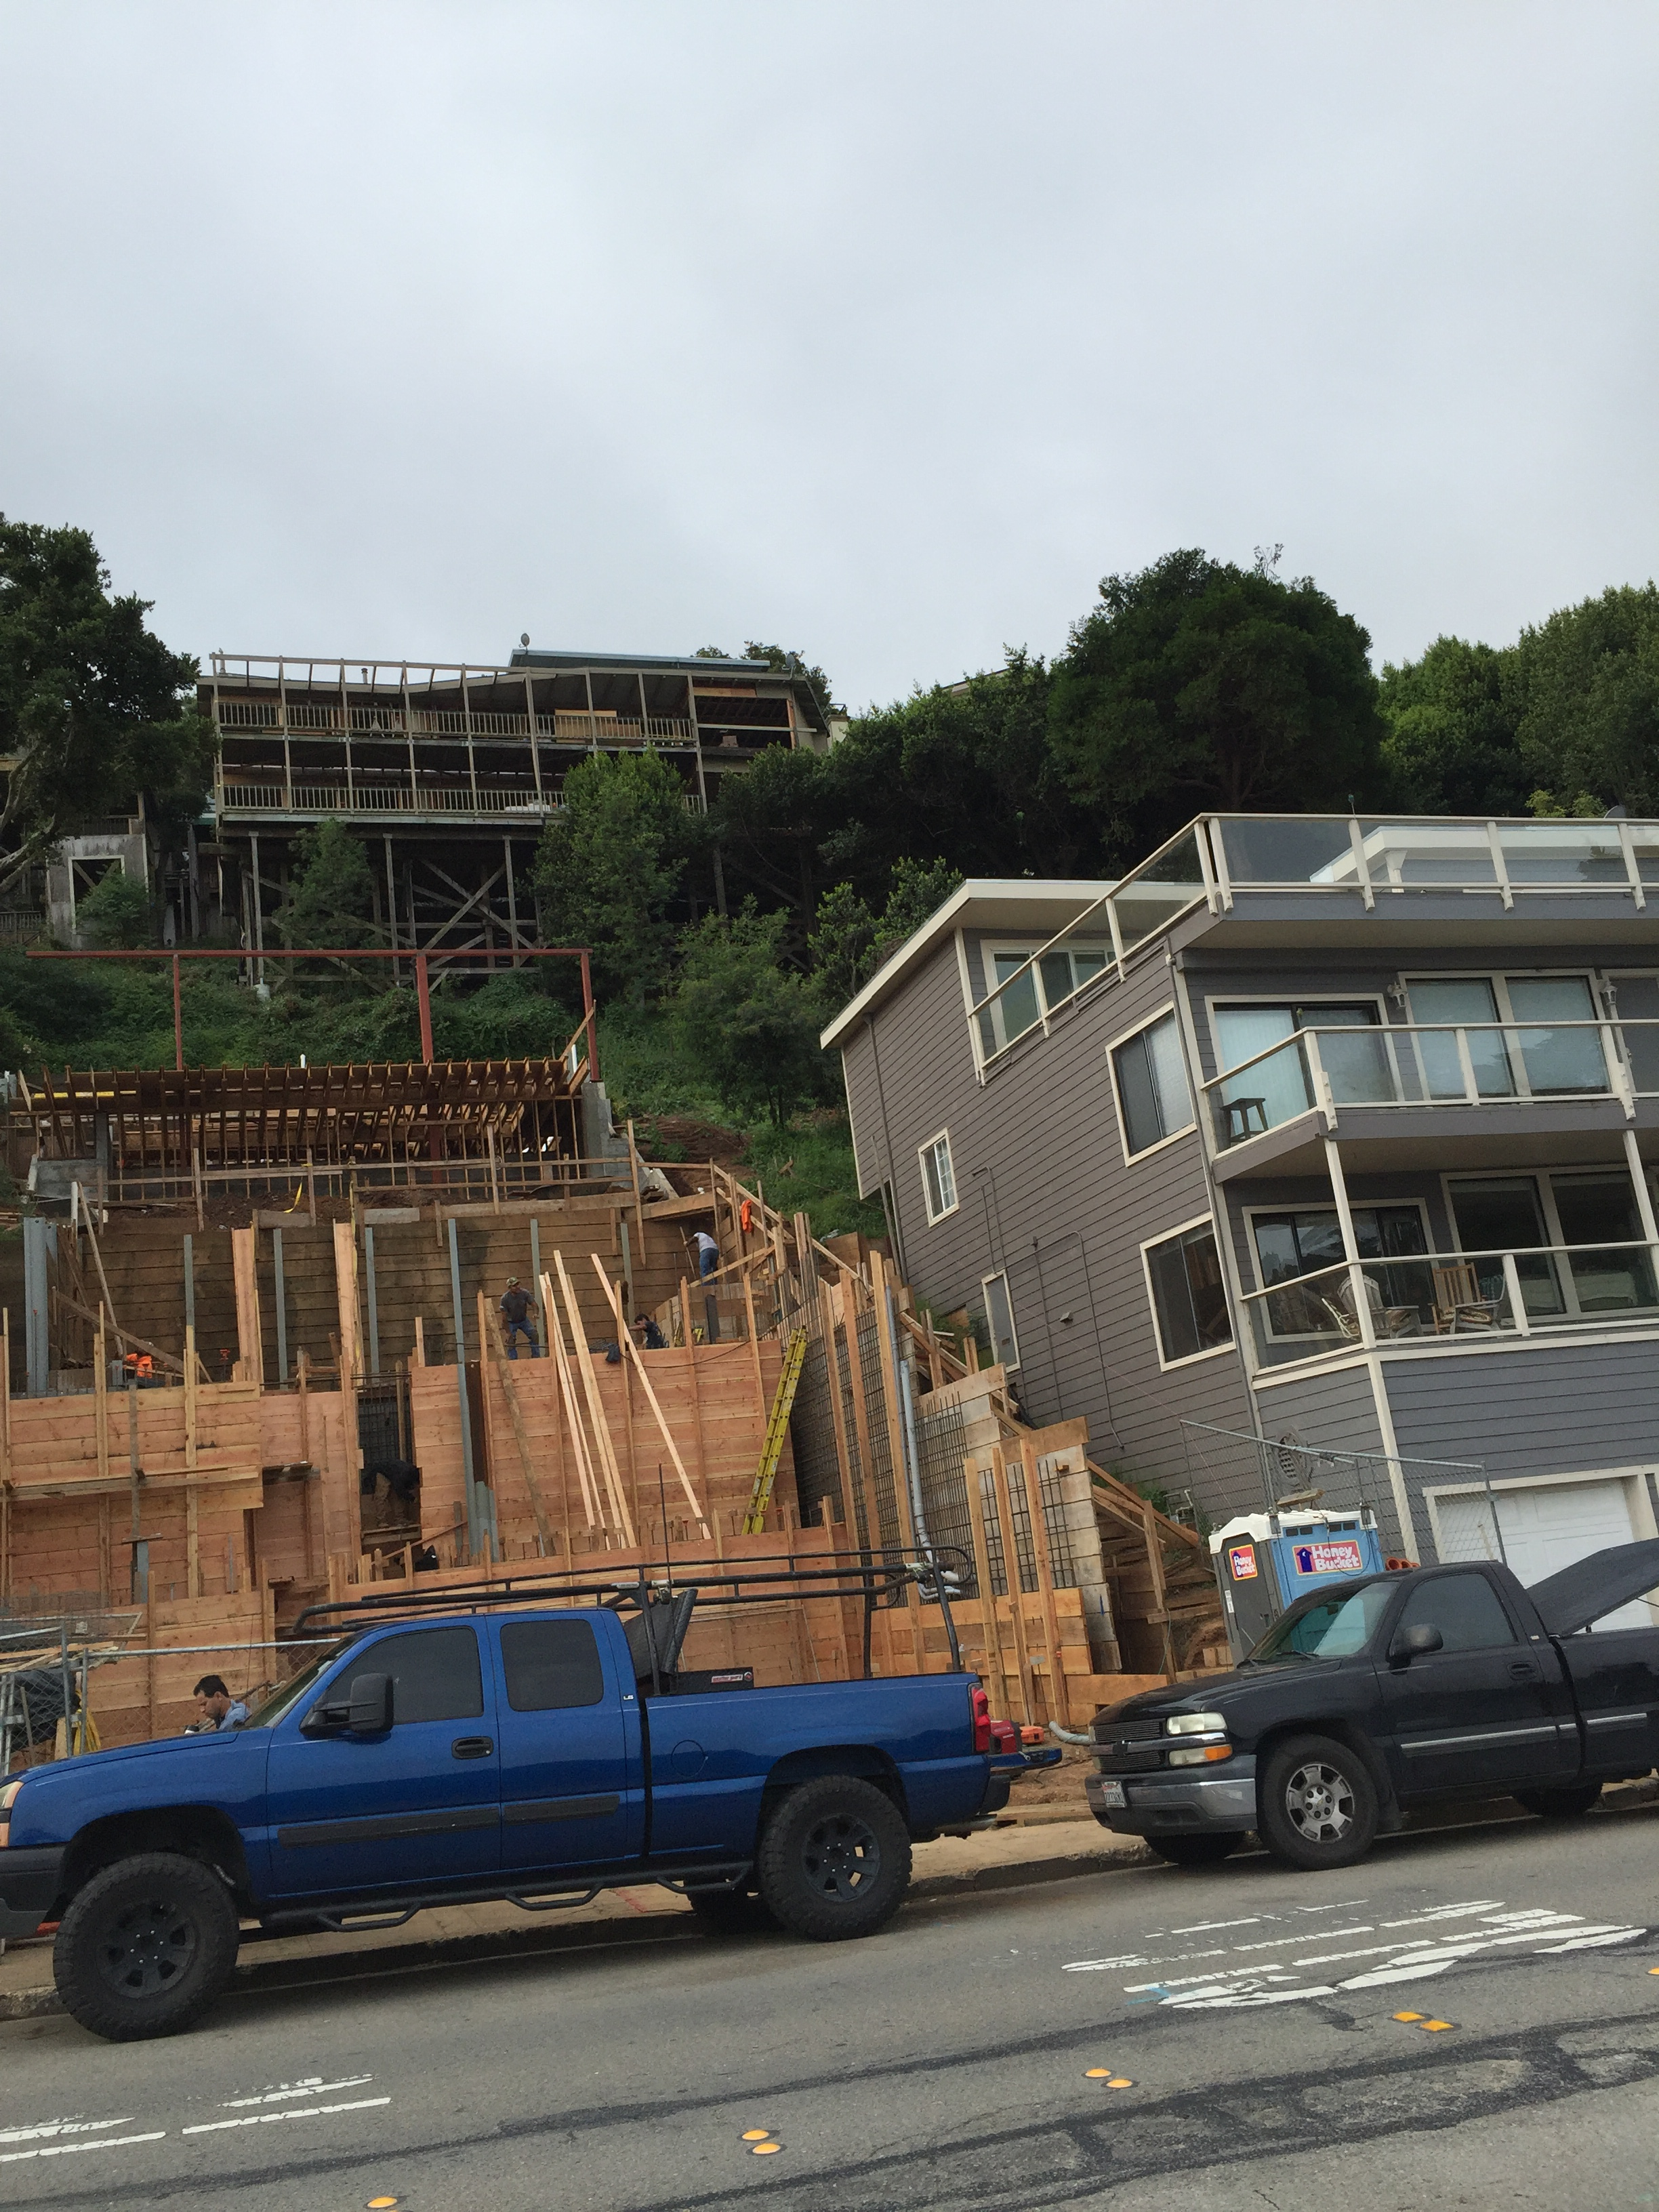 I caught them building my house. #DareToDream